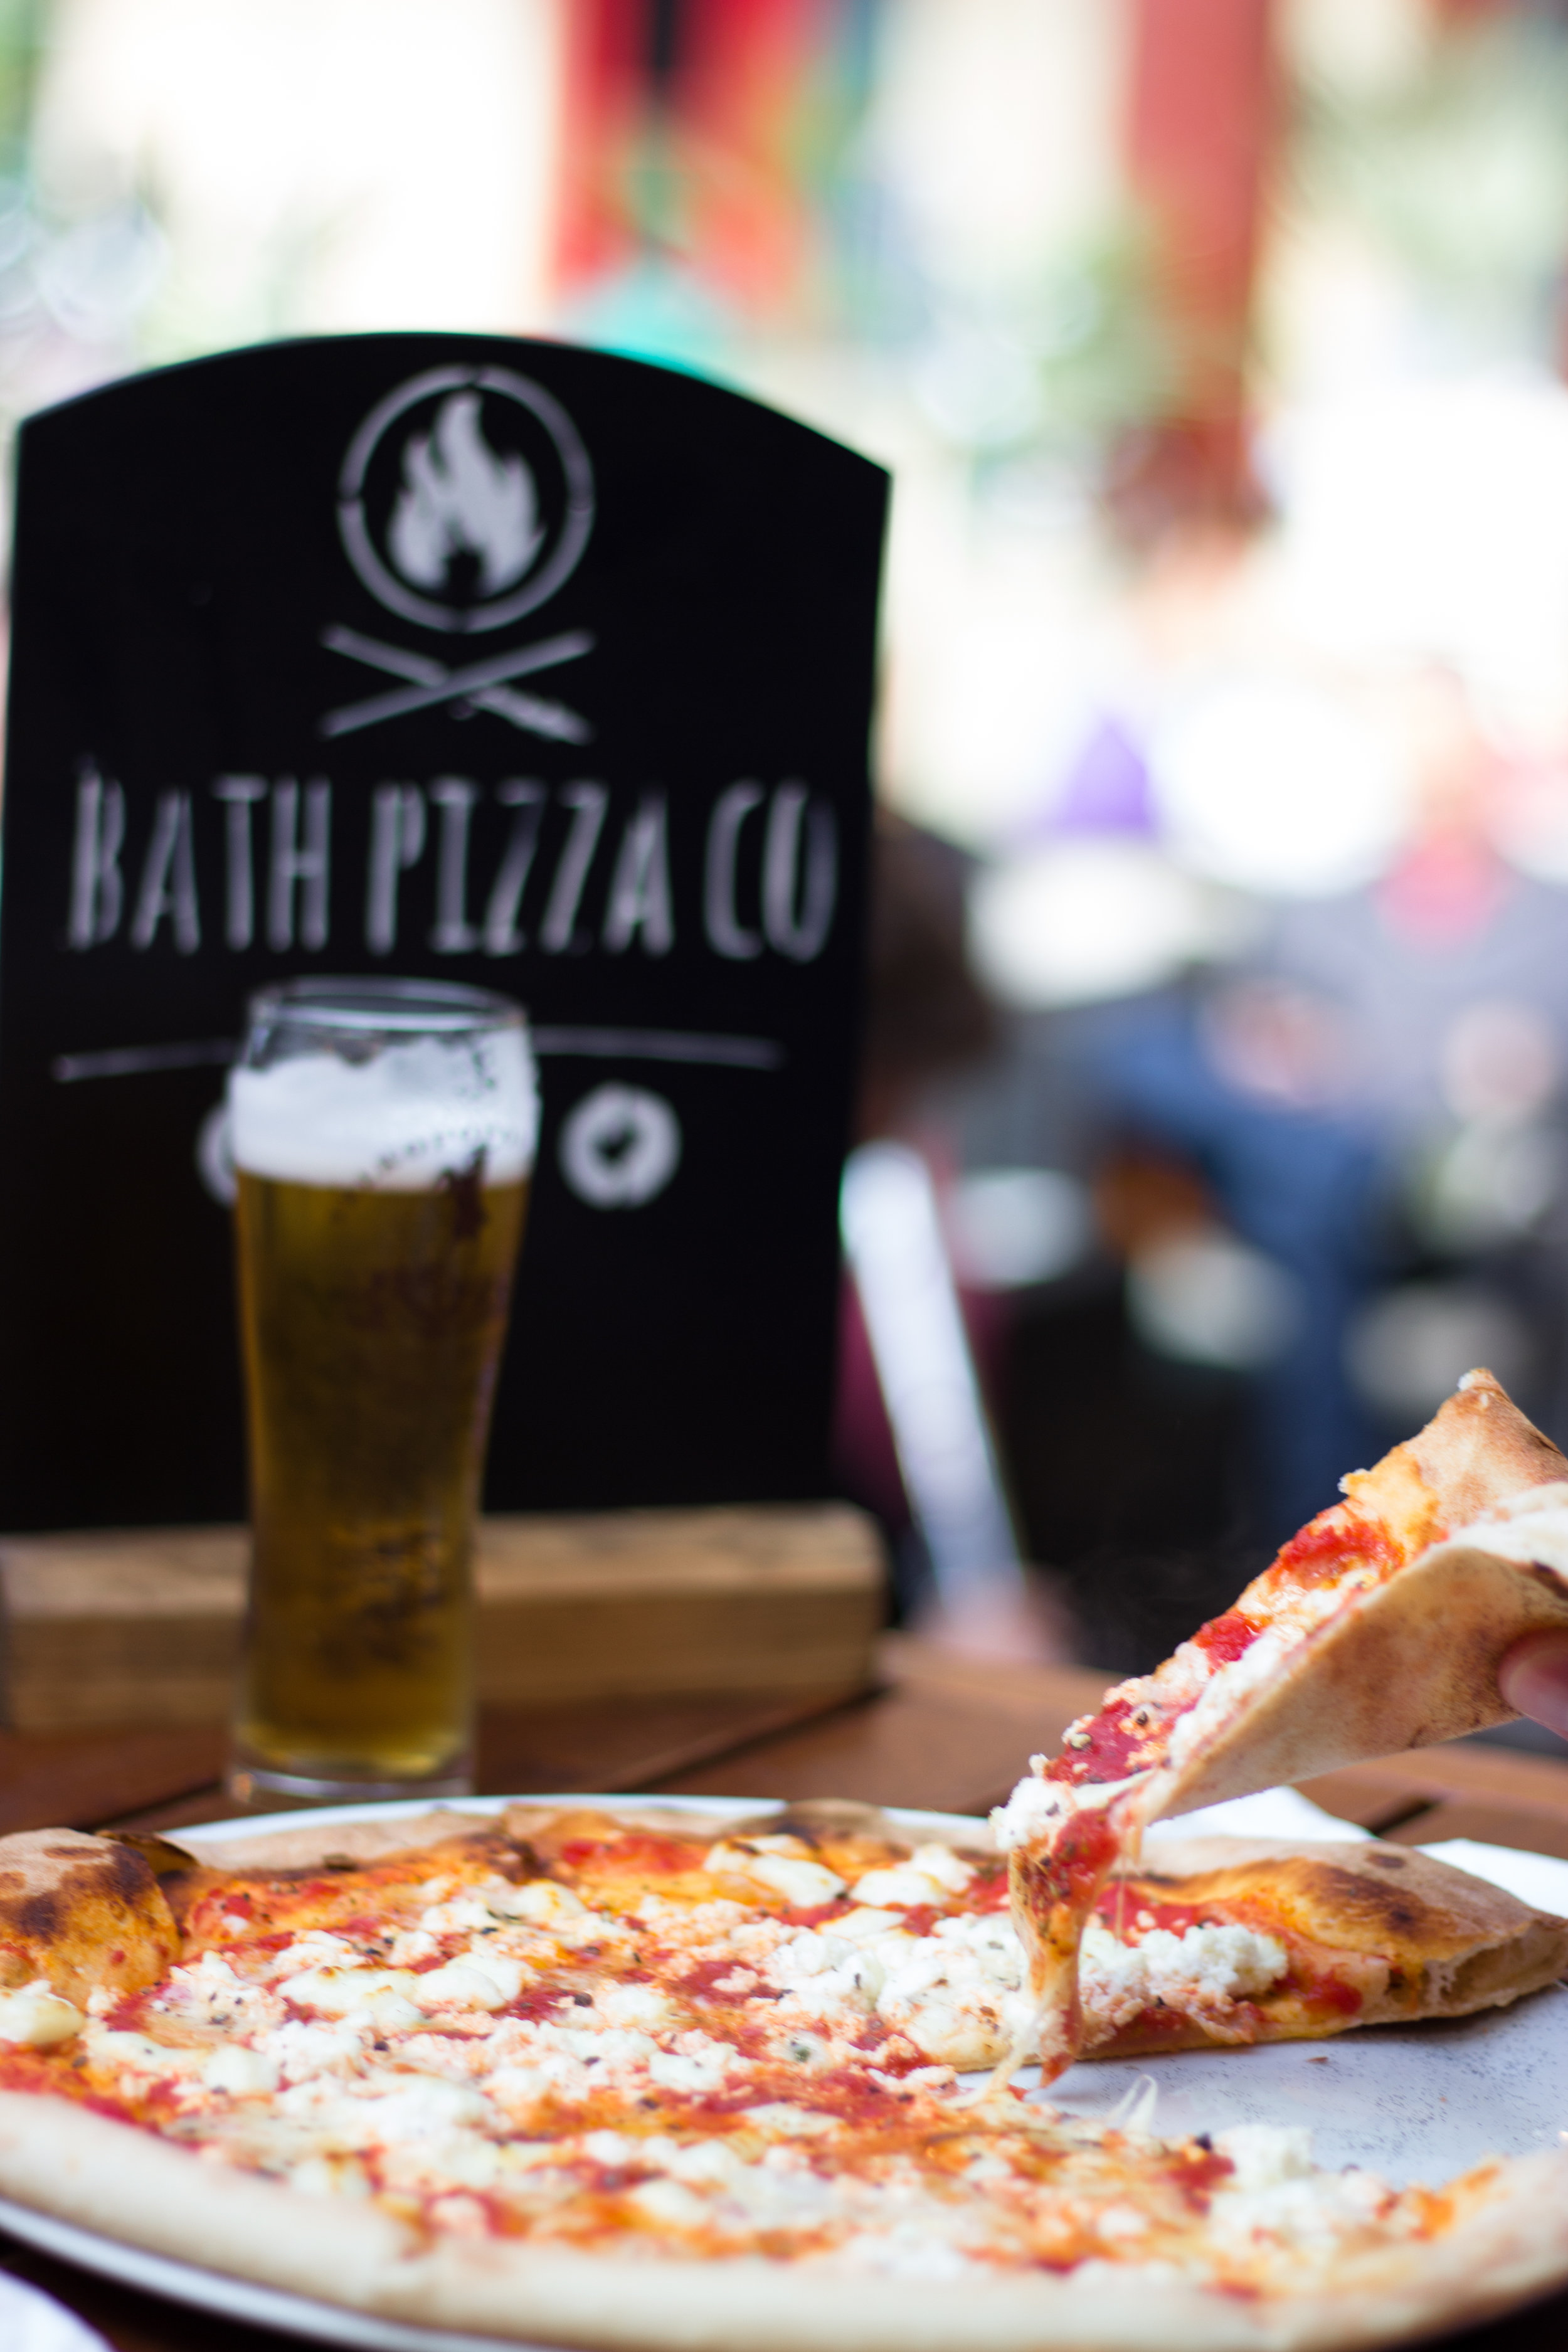 Bath Pizza Co Green Park Station Bath The Bathonian